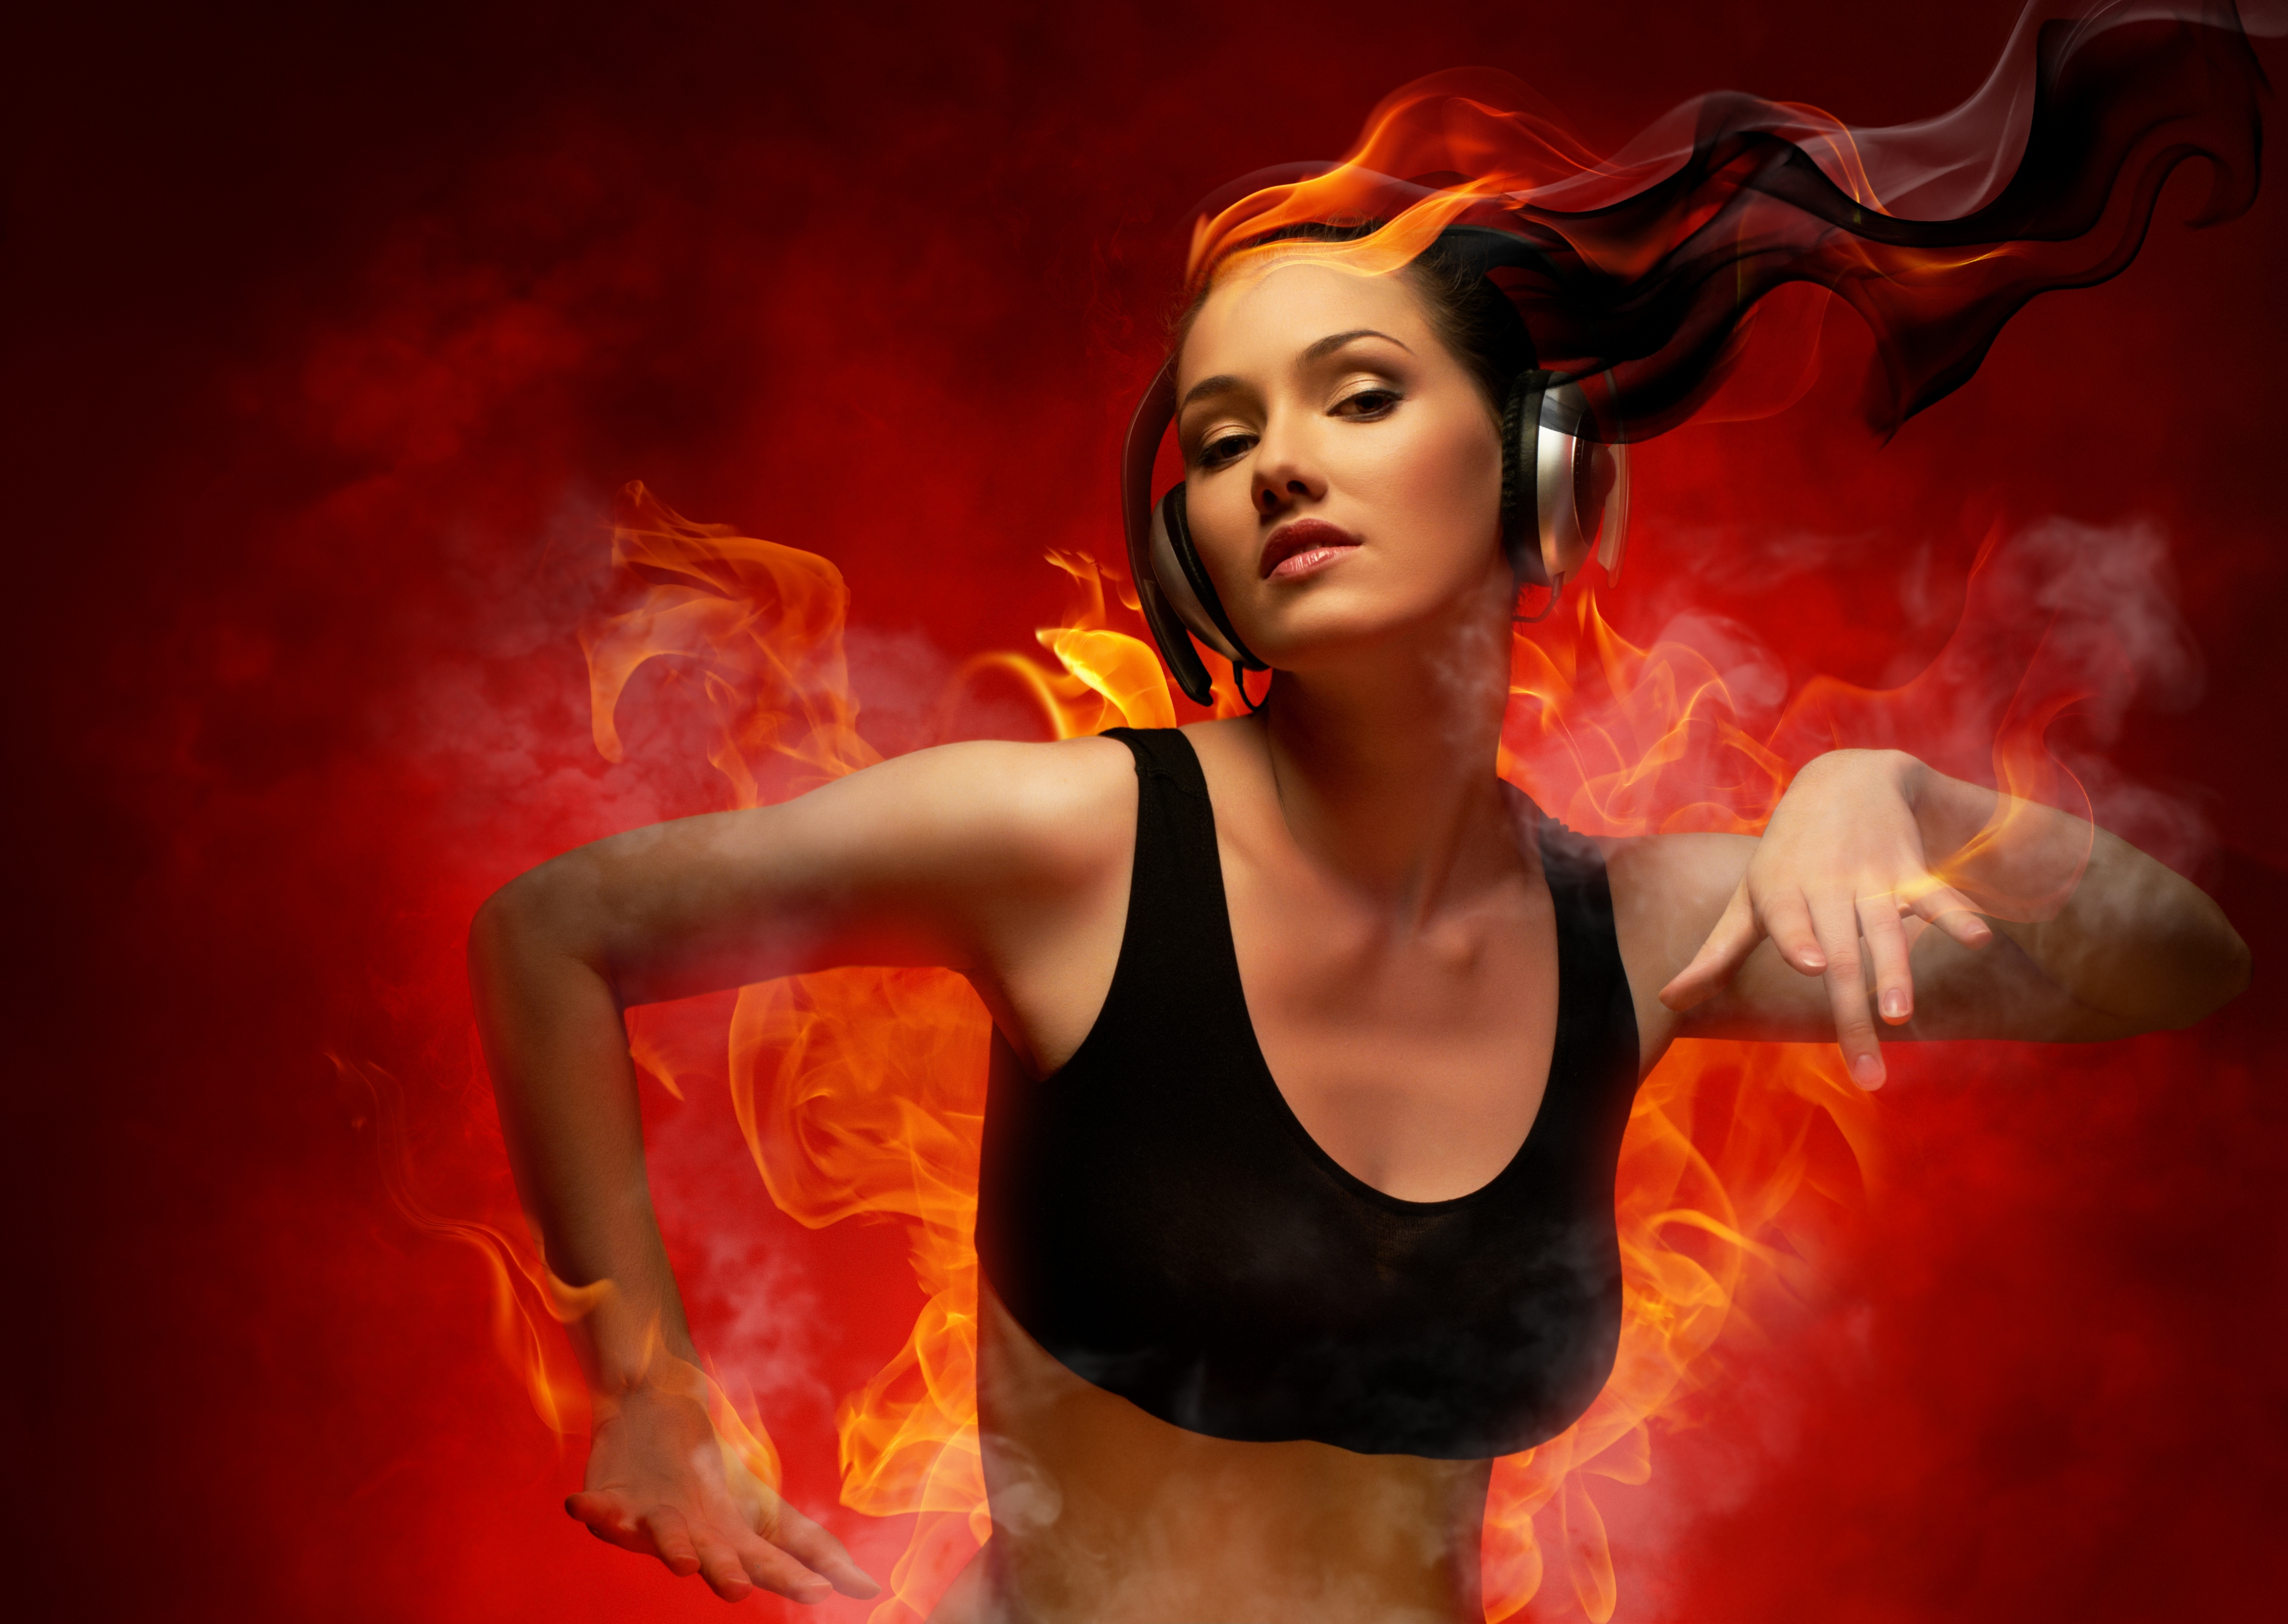 креативные картинки огонь